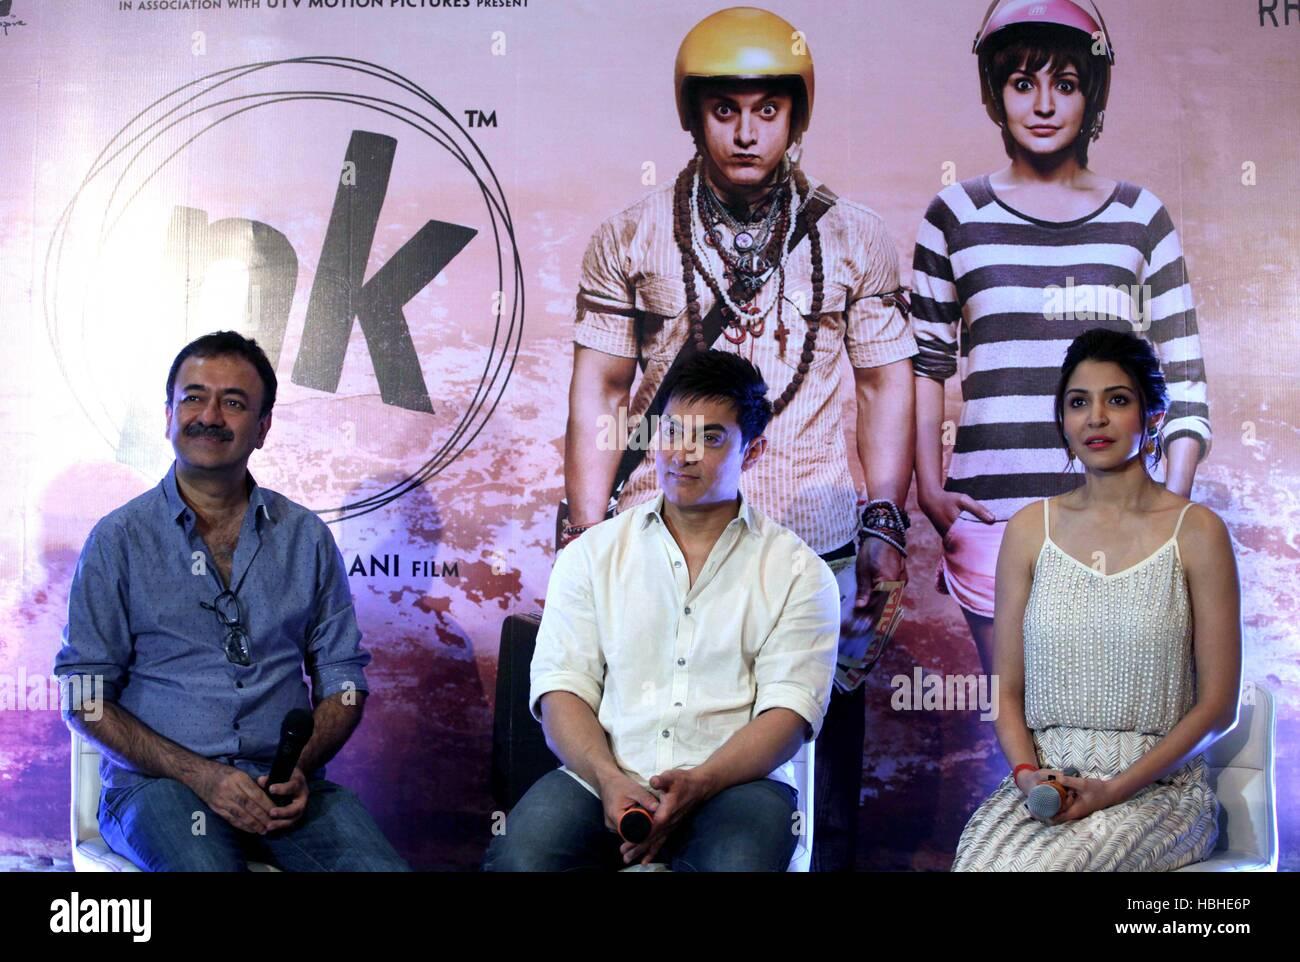 Bollywood filmmaker Rajkumar Hirani Aamir Khan Anushka Sharma during press conference to promote upcoming film PK - Stock Image